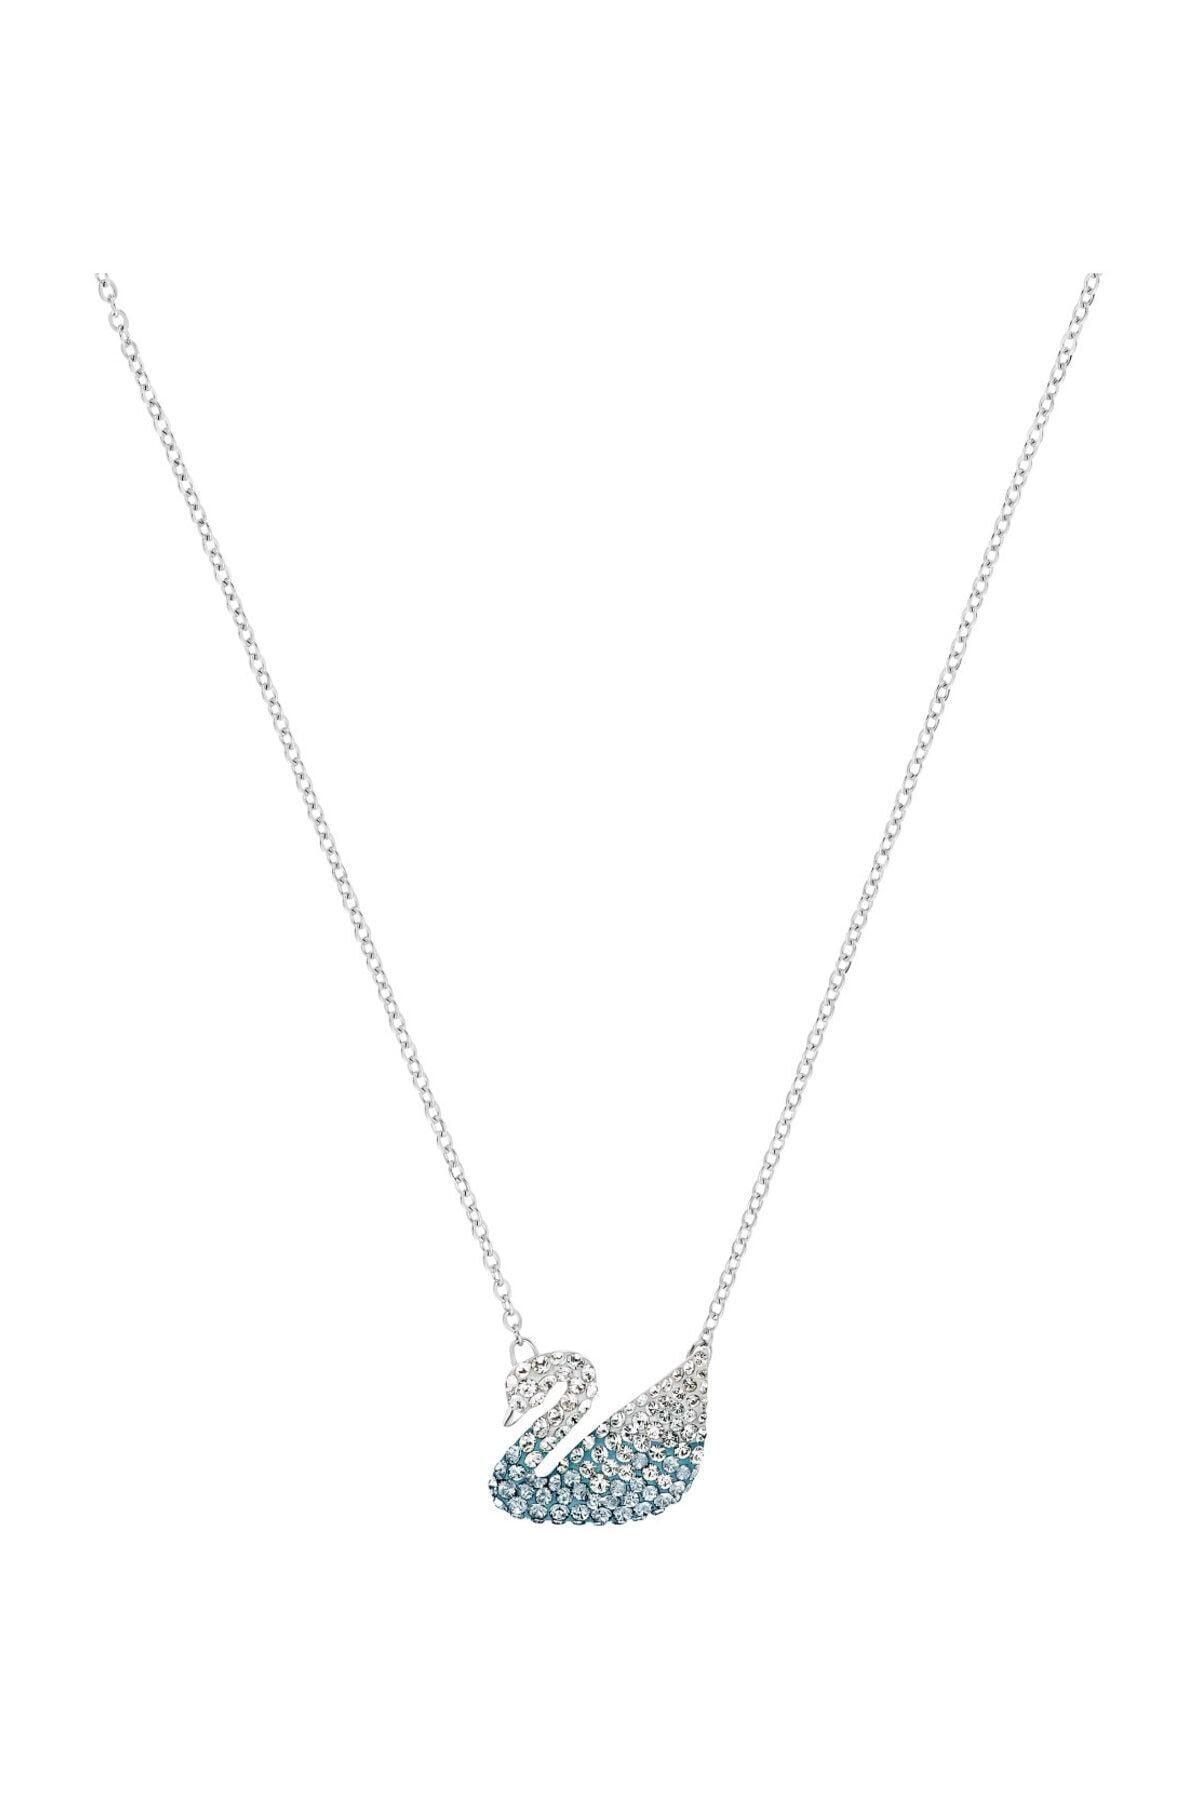 Swarovski Kolye İconic Swan:Pendant Lmul/Rhs Blue 5512095 1